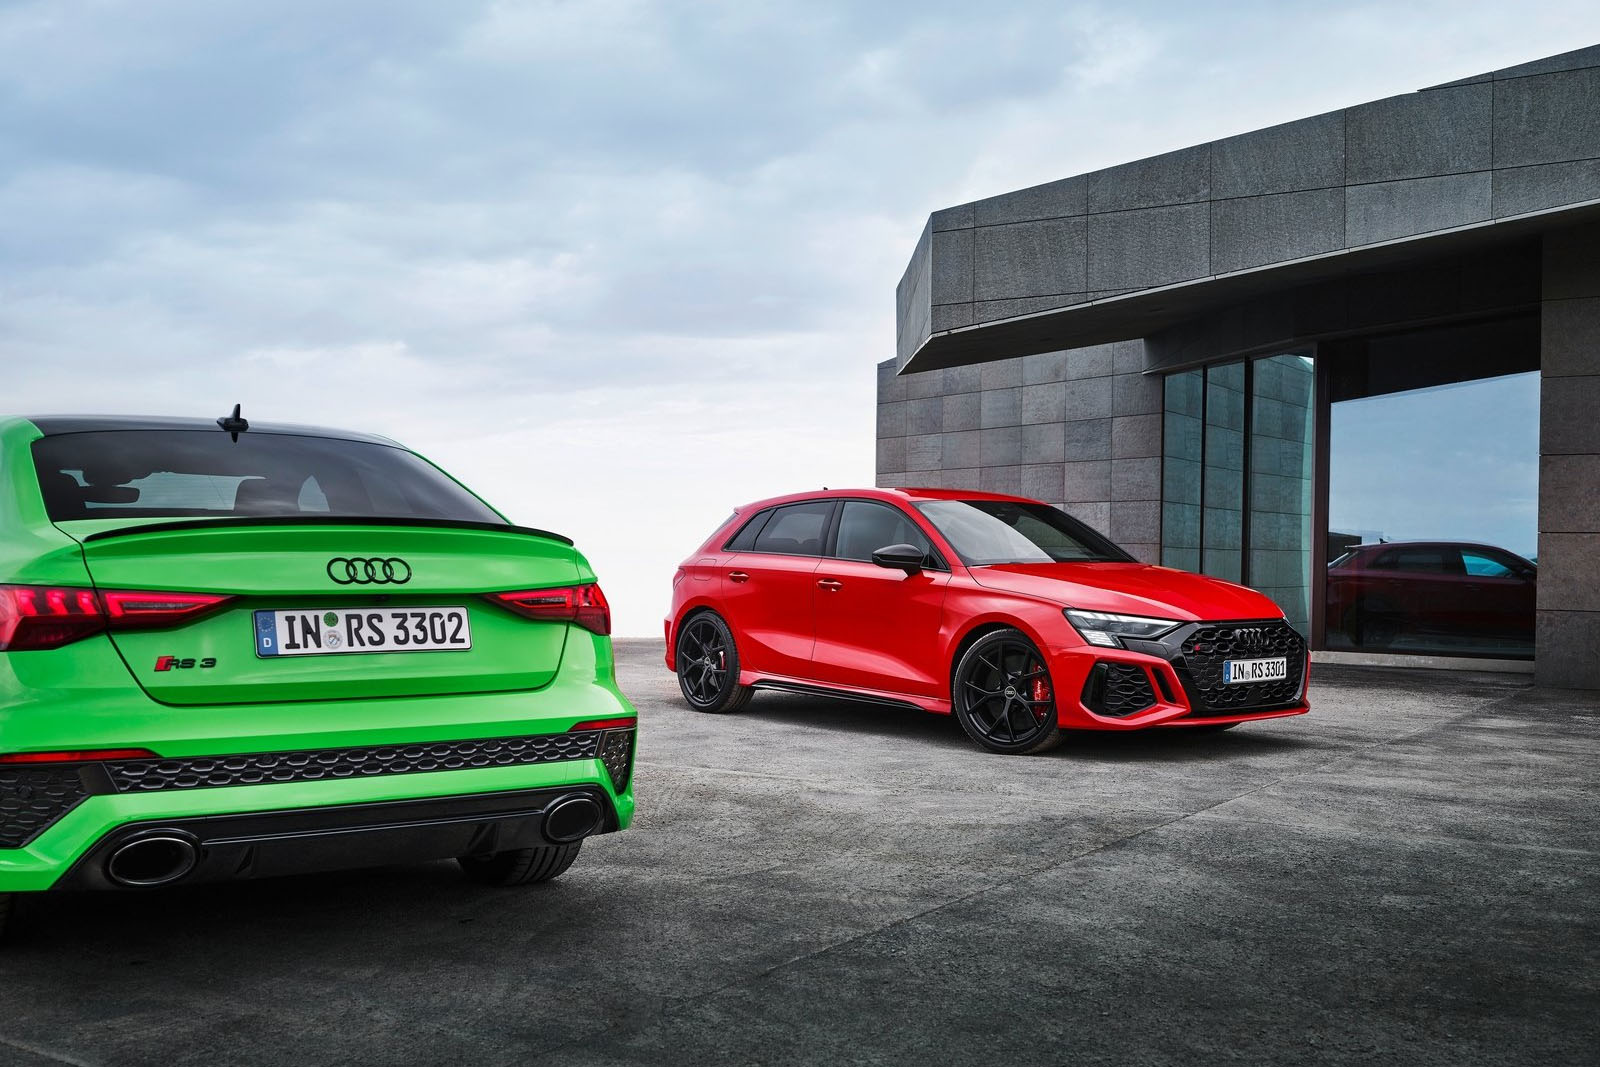 Audi RS3-2022 Sportback